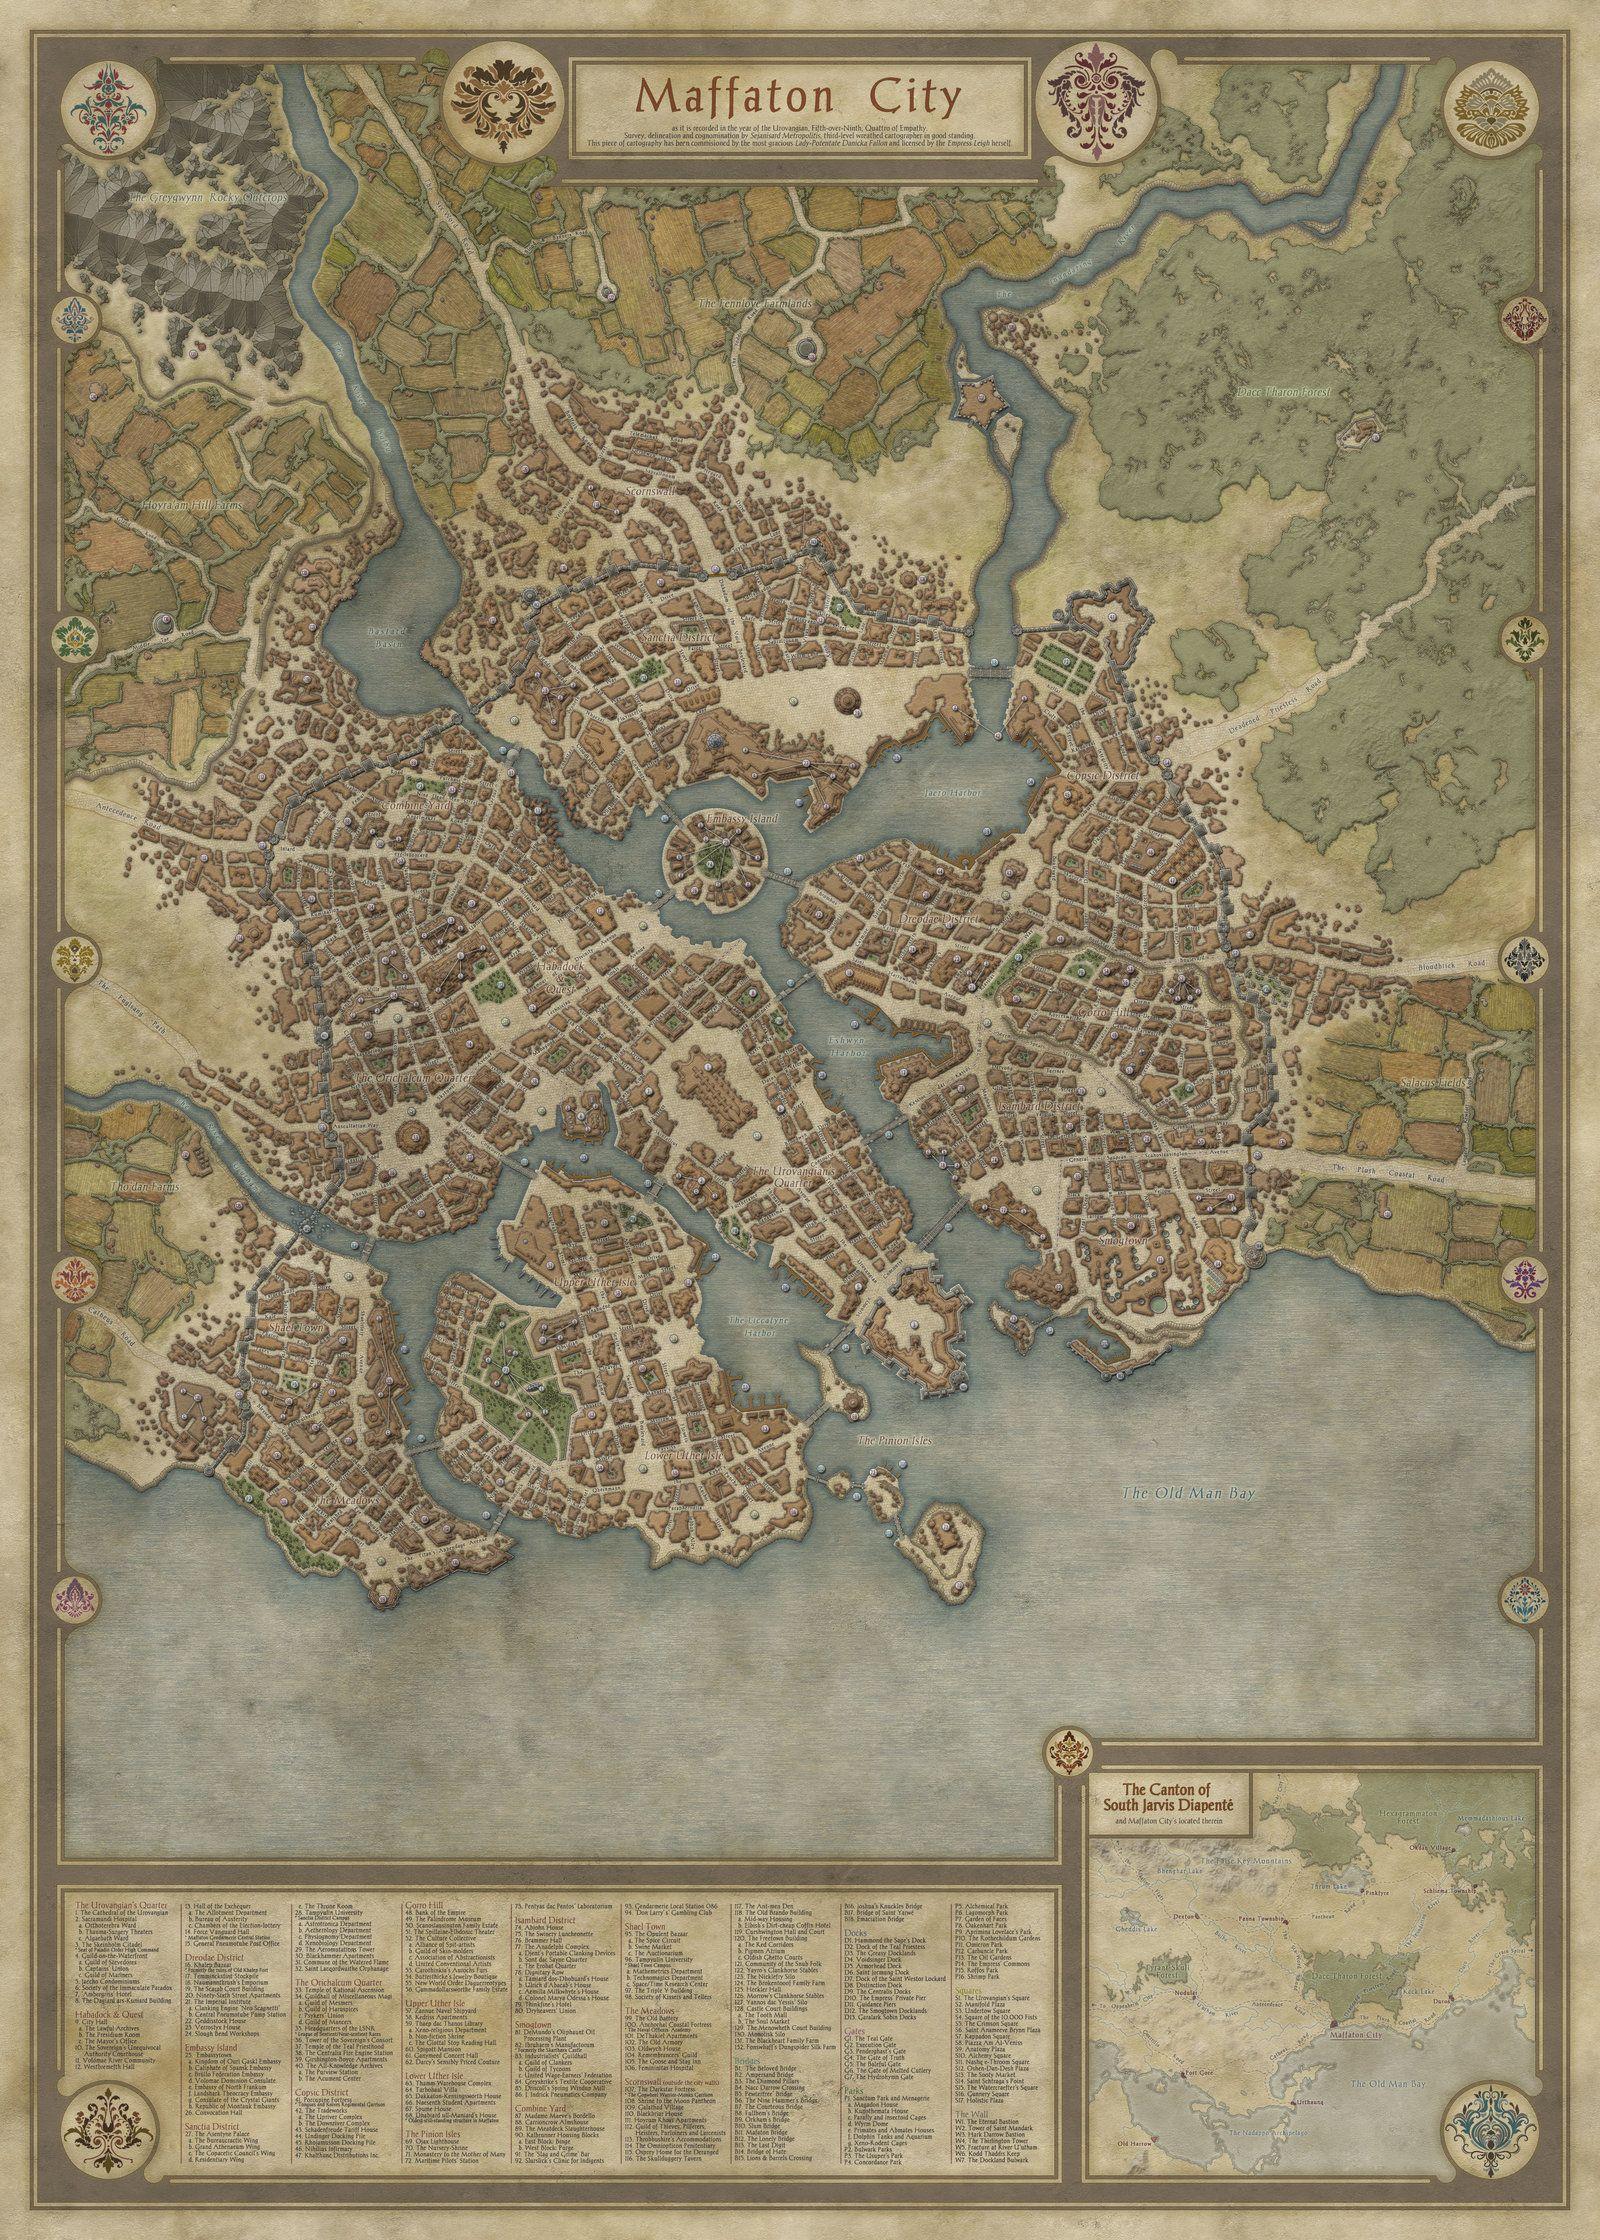 Final Fantasy 13 World Map.Maffaton City Daelind Maps Pinterest City Fantasy Map And Rpg